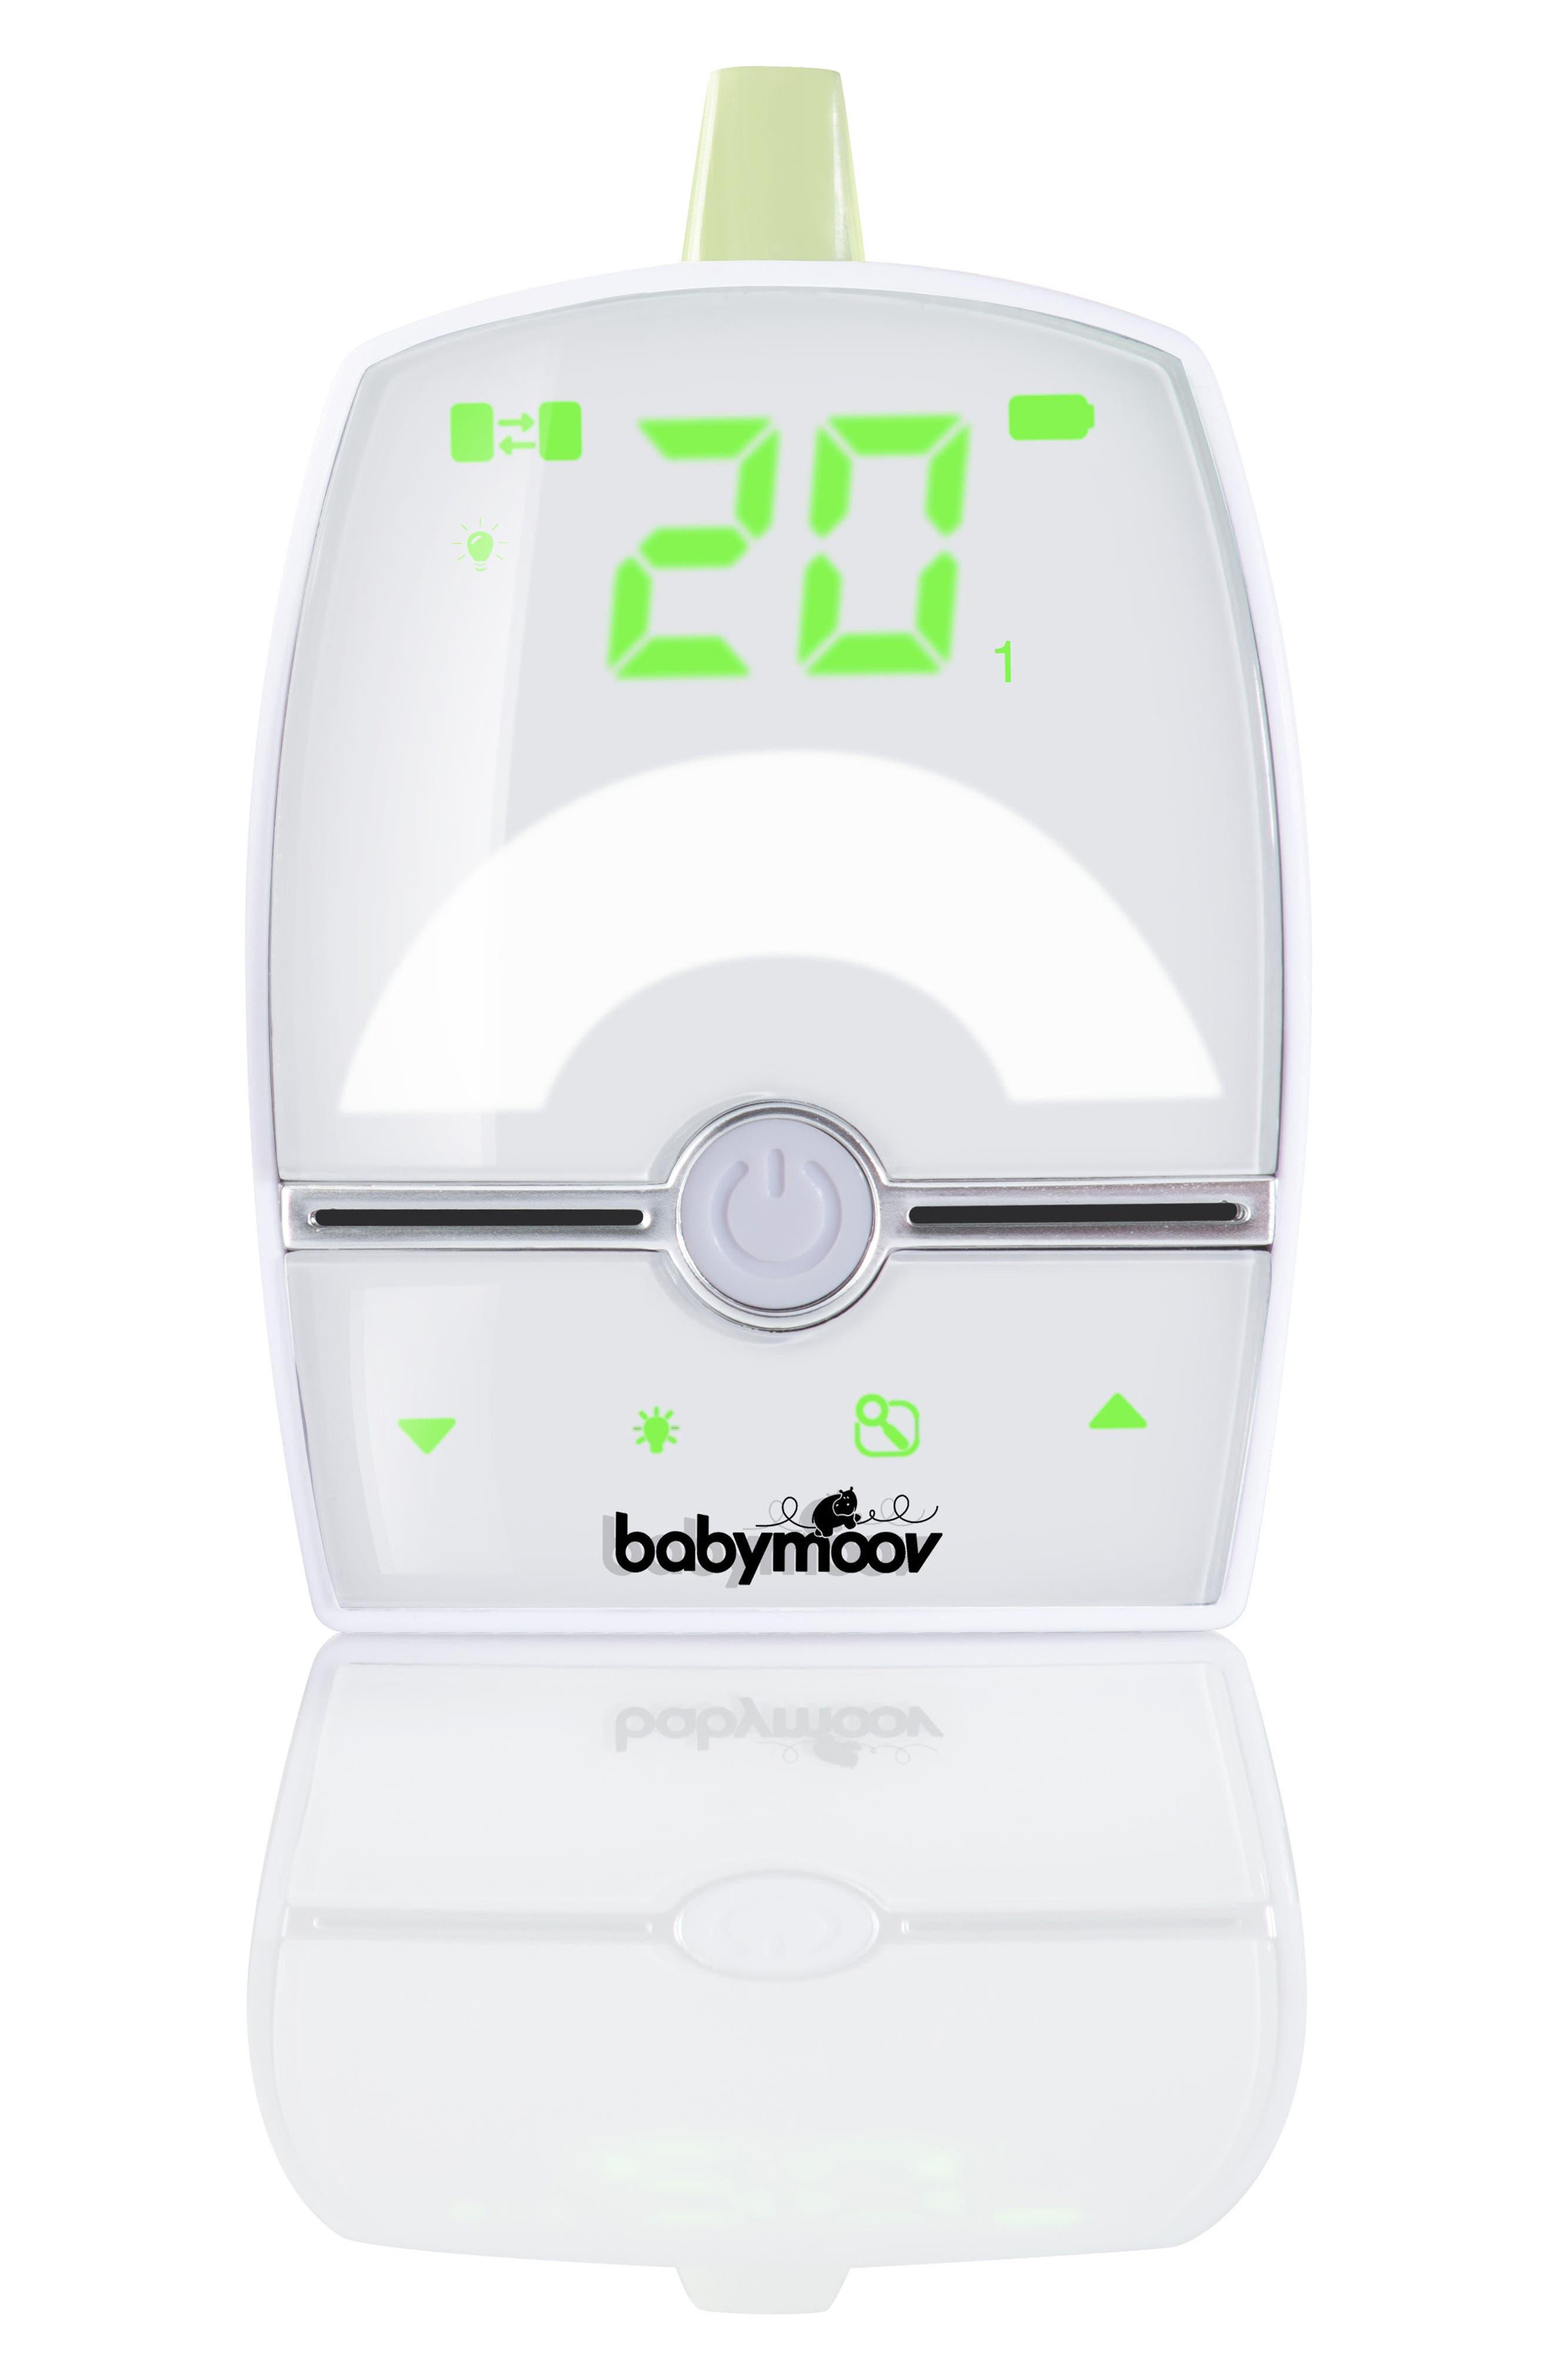 Extra Transmitter for Babymoov Premium Care Baby Moniter,                         Main,                         color, 100